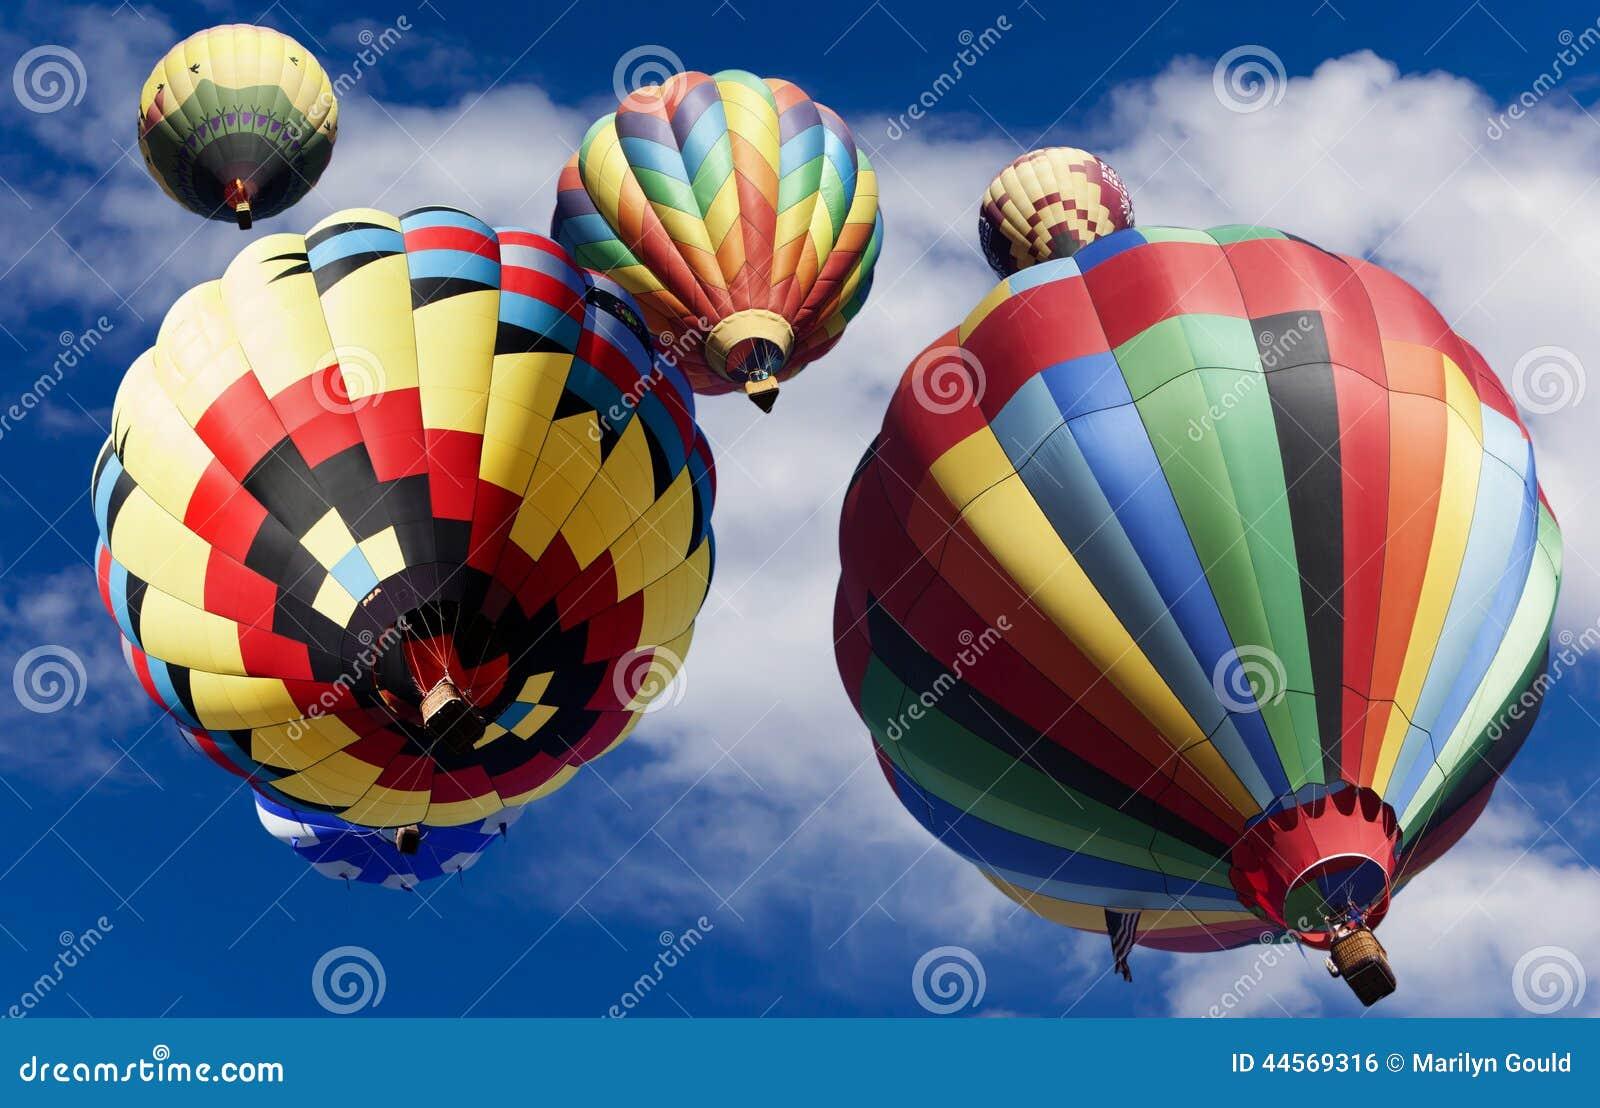 Hot Air Balloons Drifting Upward